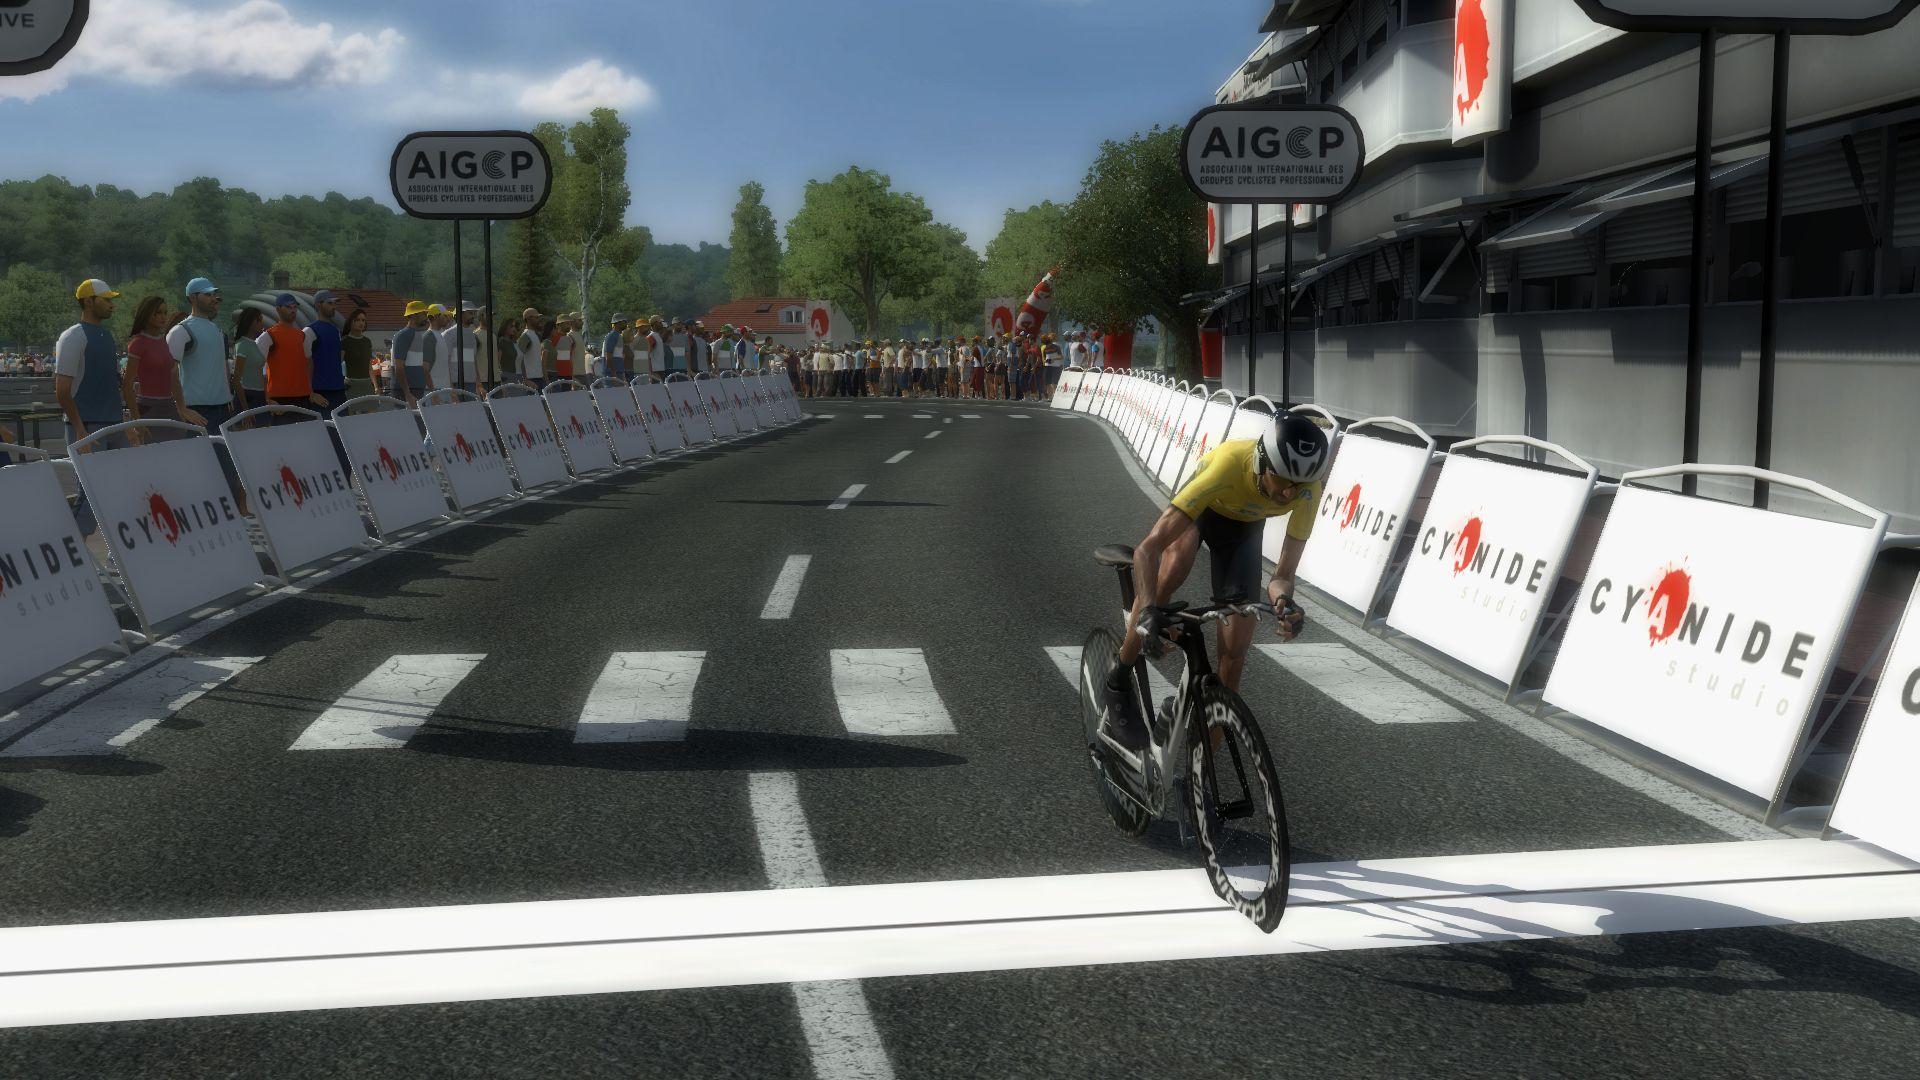 pcmdaily.com/images/mg/2019/Races/C1/Bayern/S4/mg19_bay_s04_54.jpg